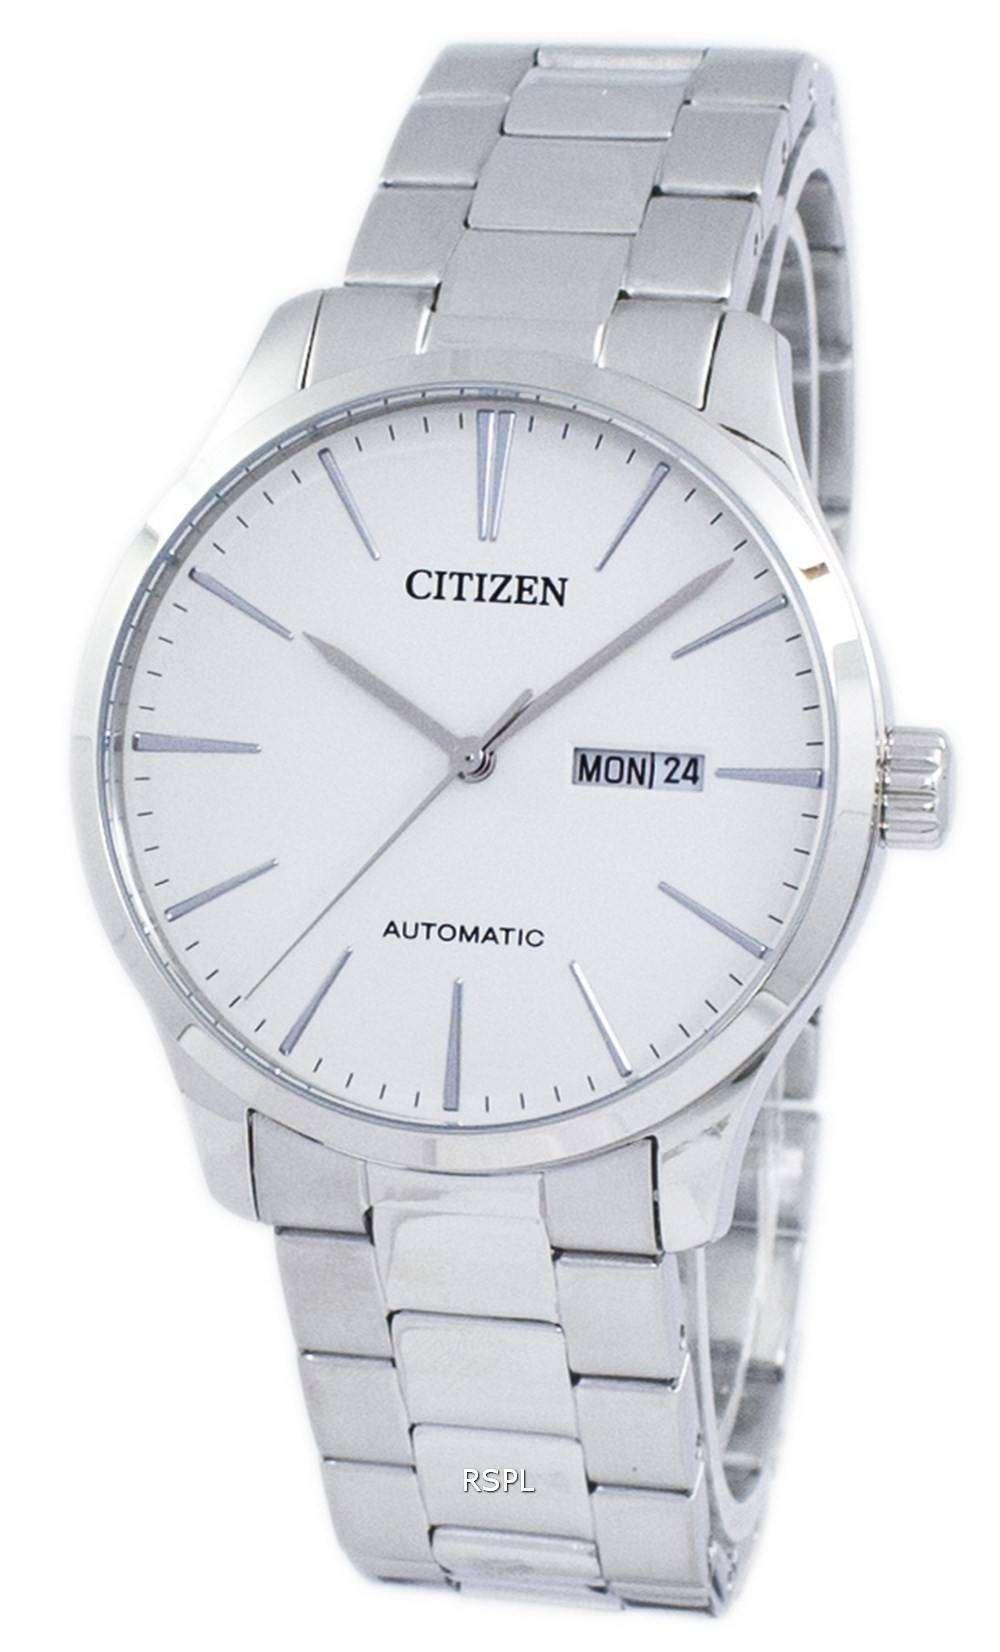 b3ed9f8dabd Citizen Analog Automatic NH8350-83A Men s Watch - ZetaWatches